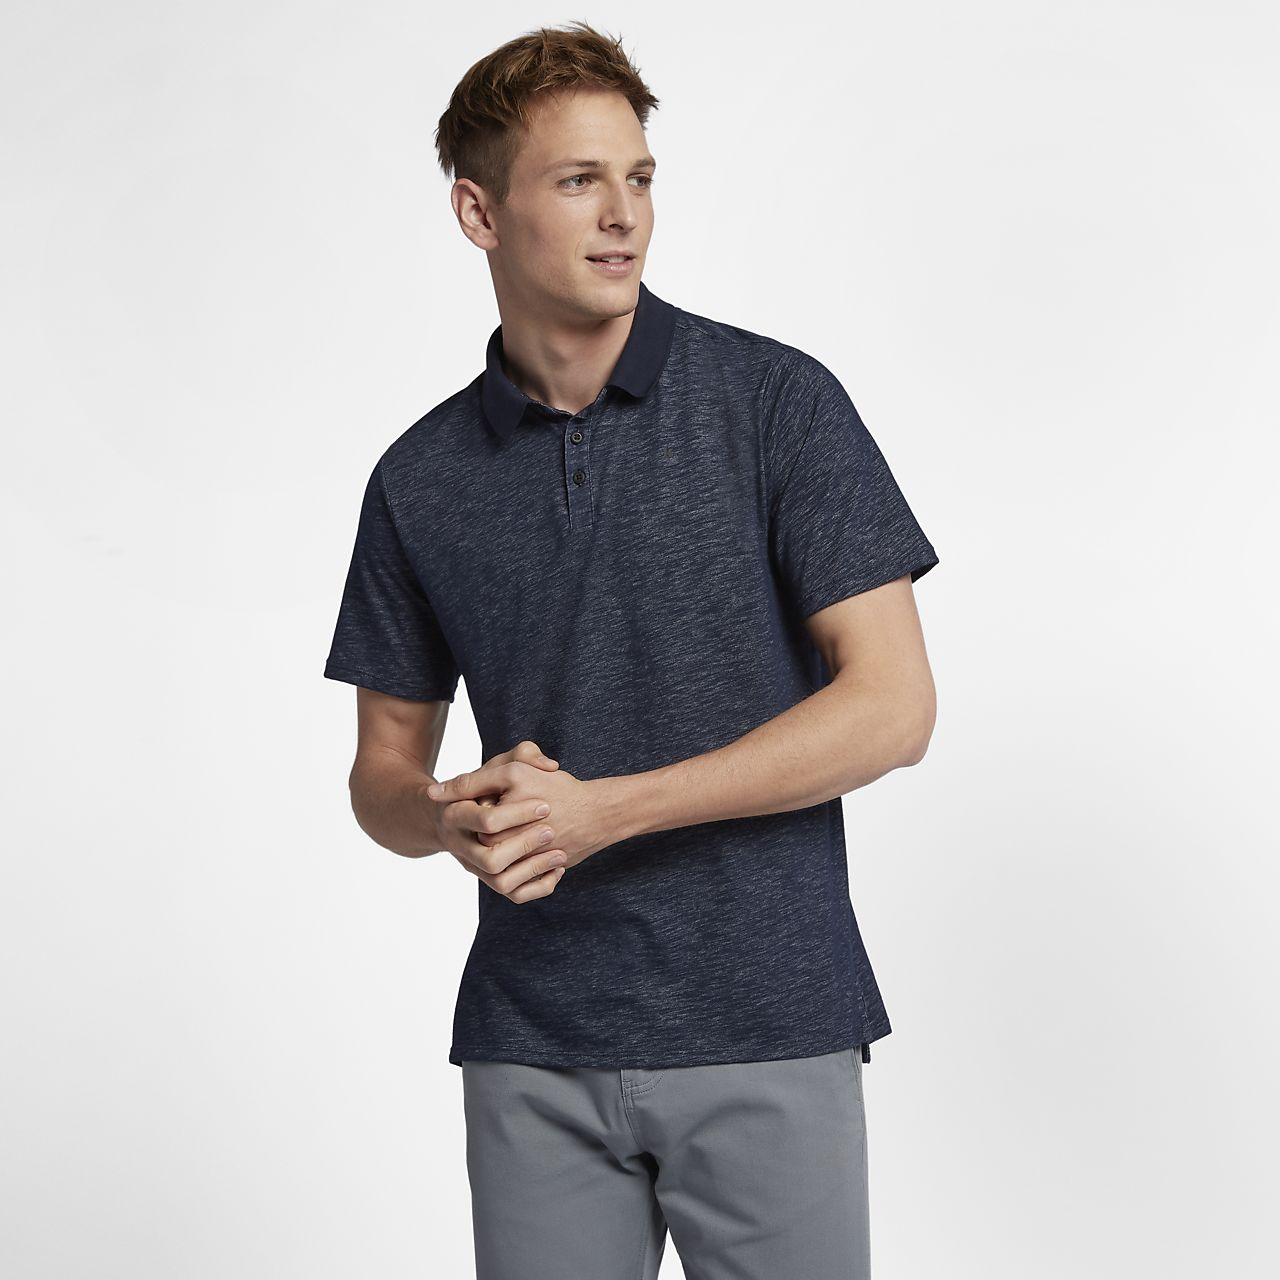 Мужская рубашка-поло с коротким рукавом Hurley Dri-FIT Lagos